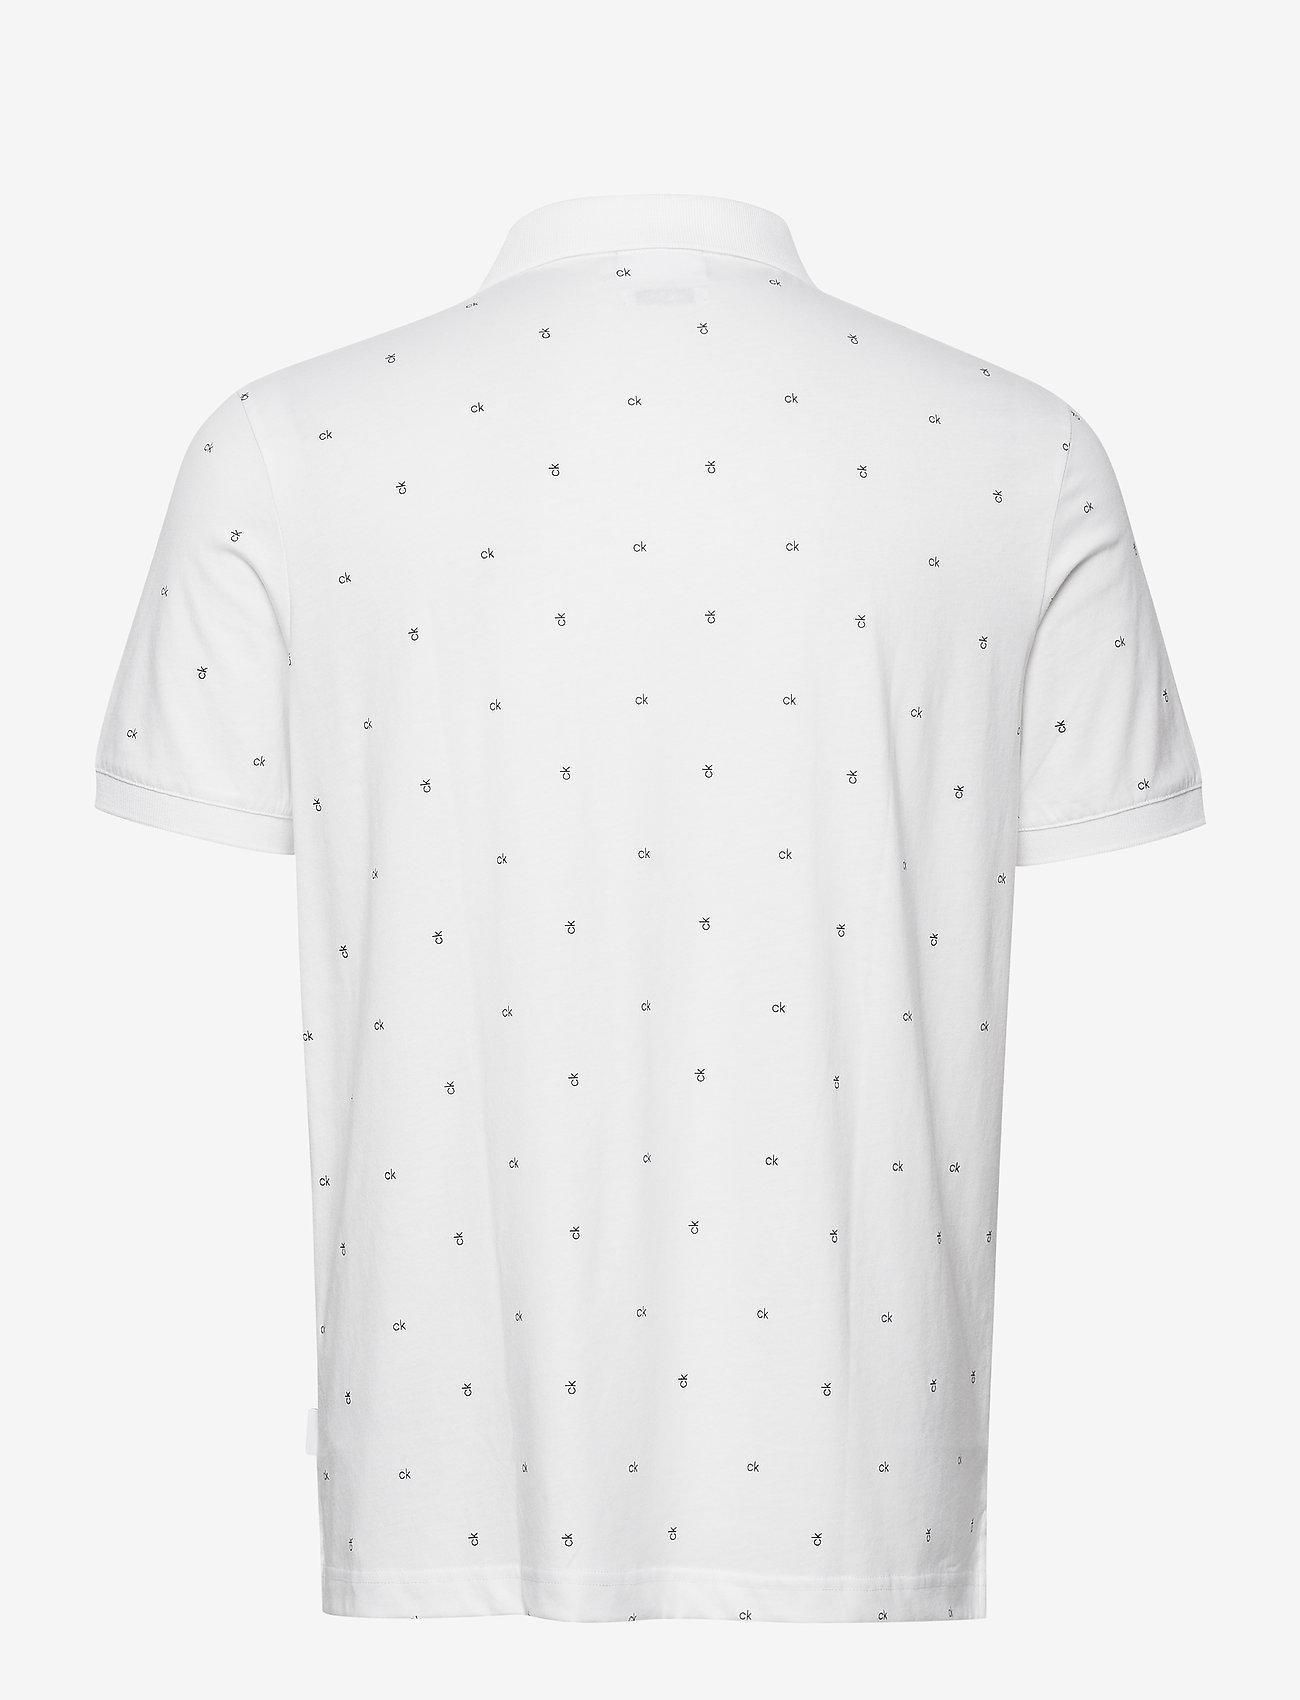 Calvin Klein - LIQUID CK MONOGRAM POLO - korte mouwen - bright white - 1